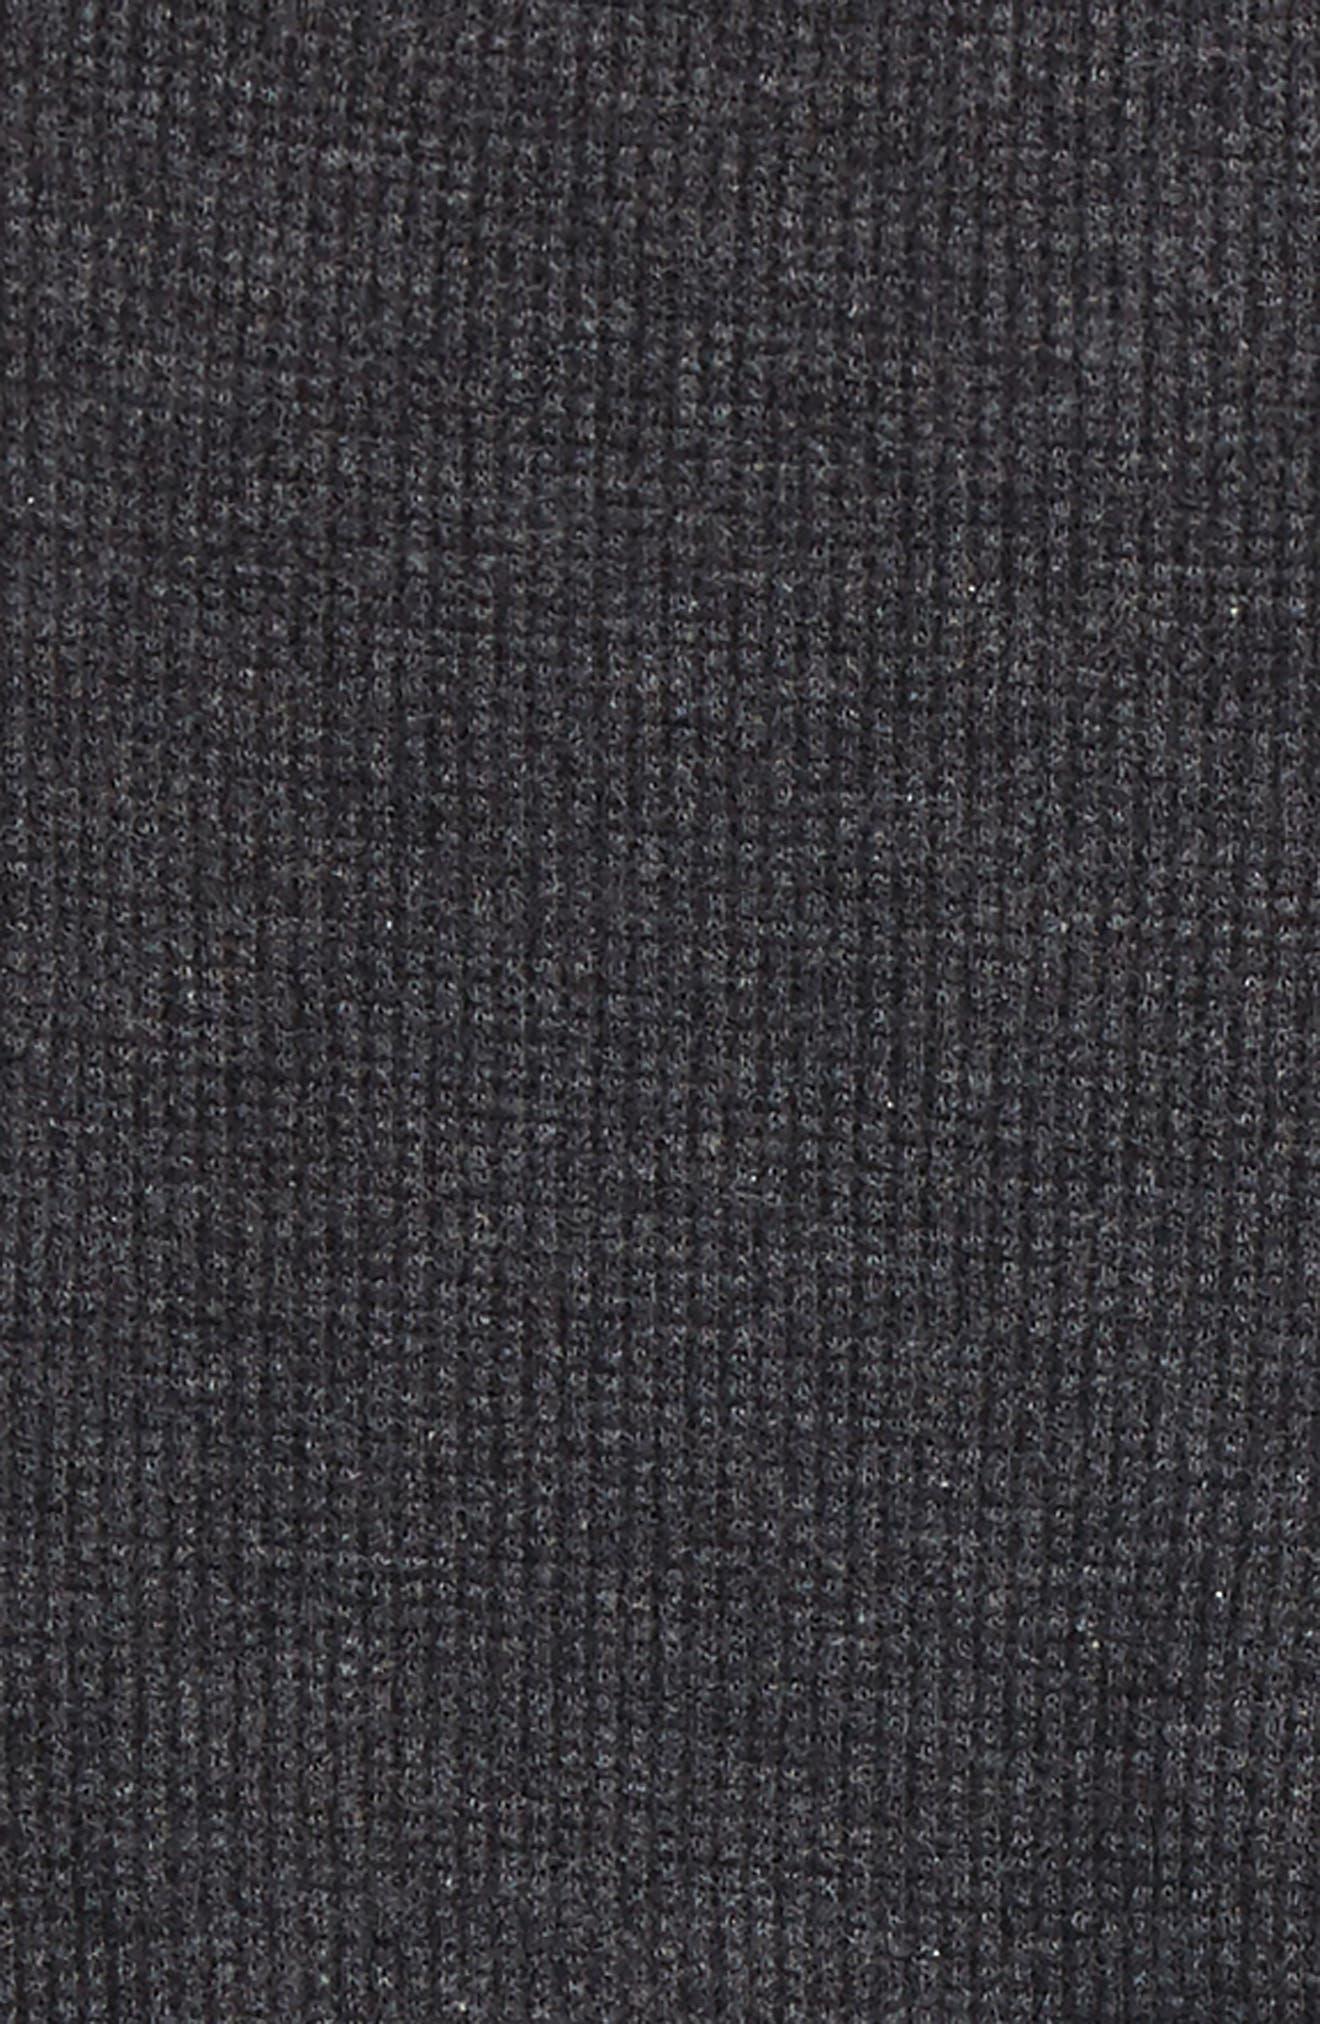 Thermal Ruffle Skater Dress & Leggings Set,                             Alternate thumbnail 3, color,